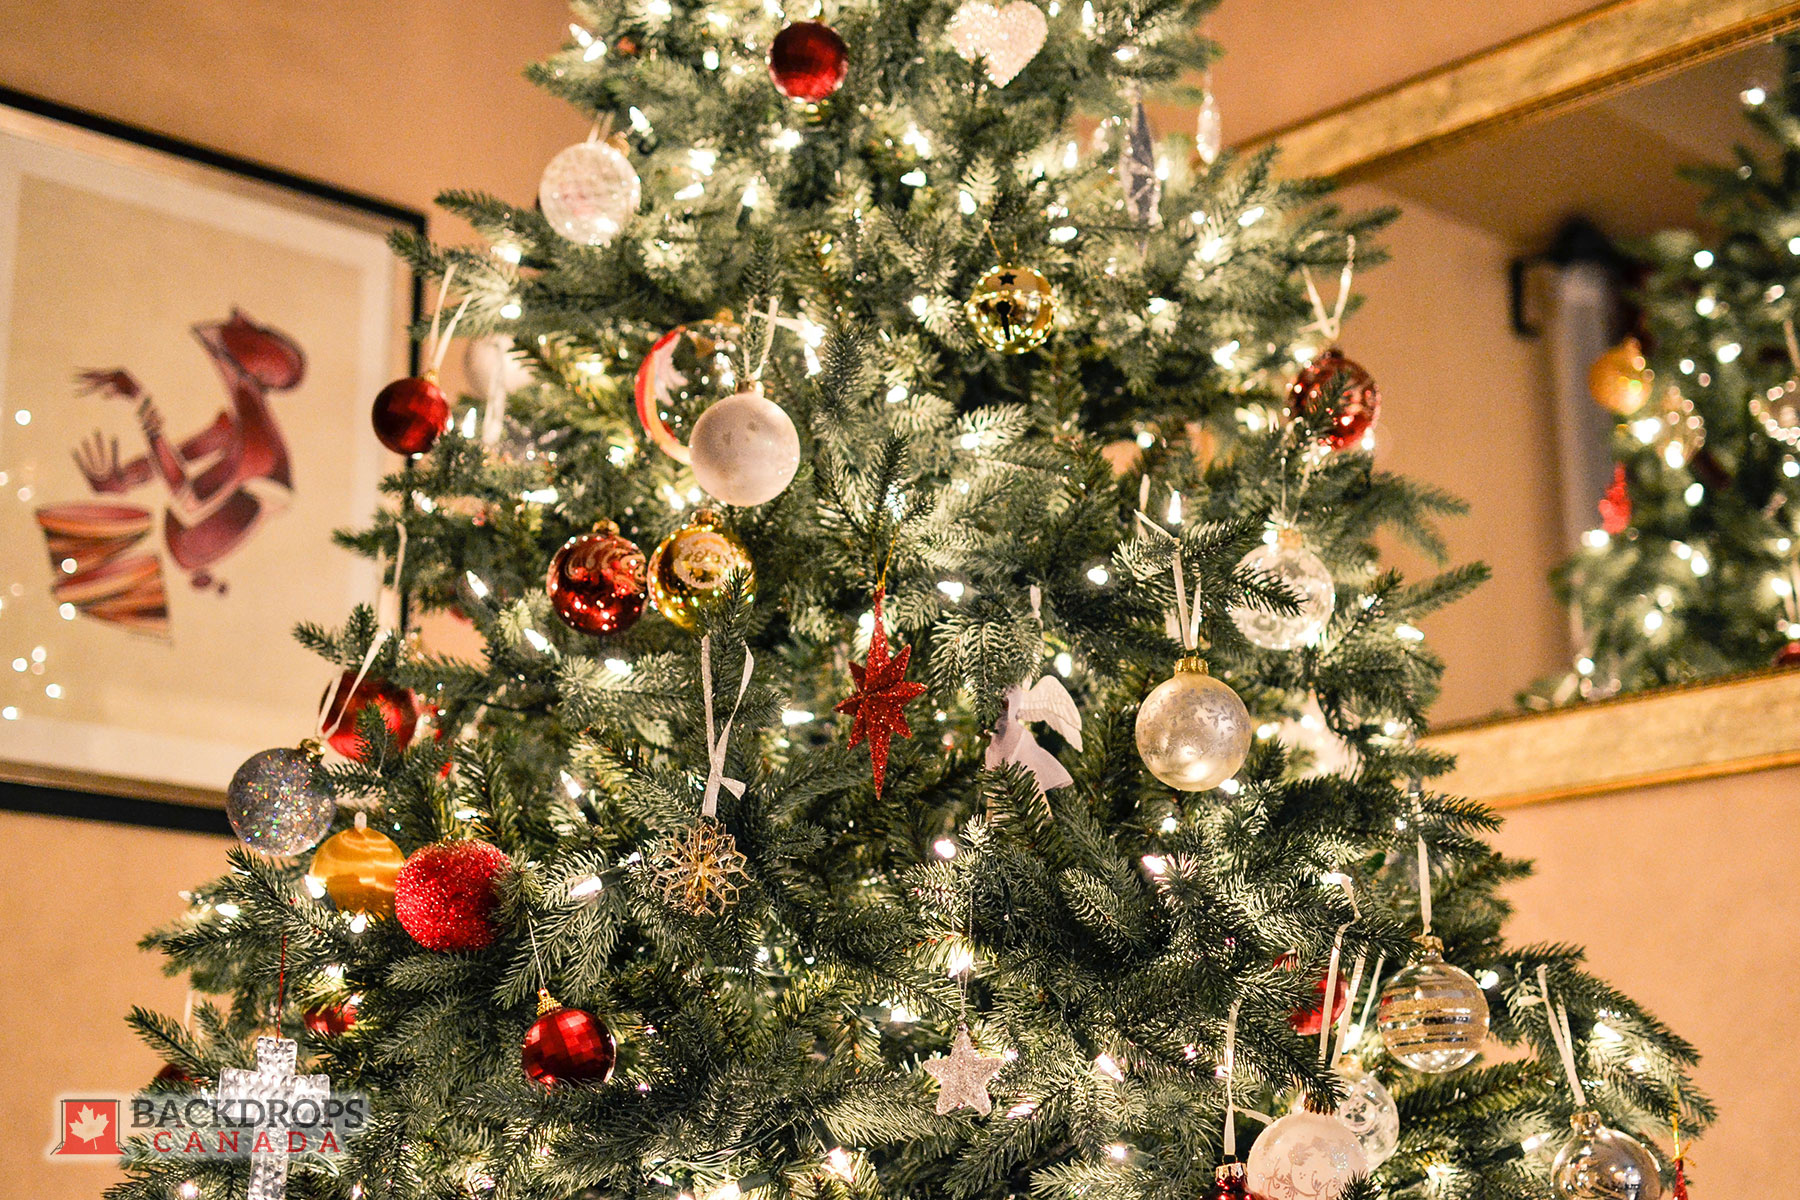 Christmas Tree Close Up Photography Backdrop